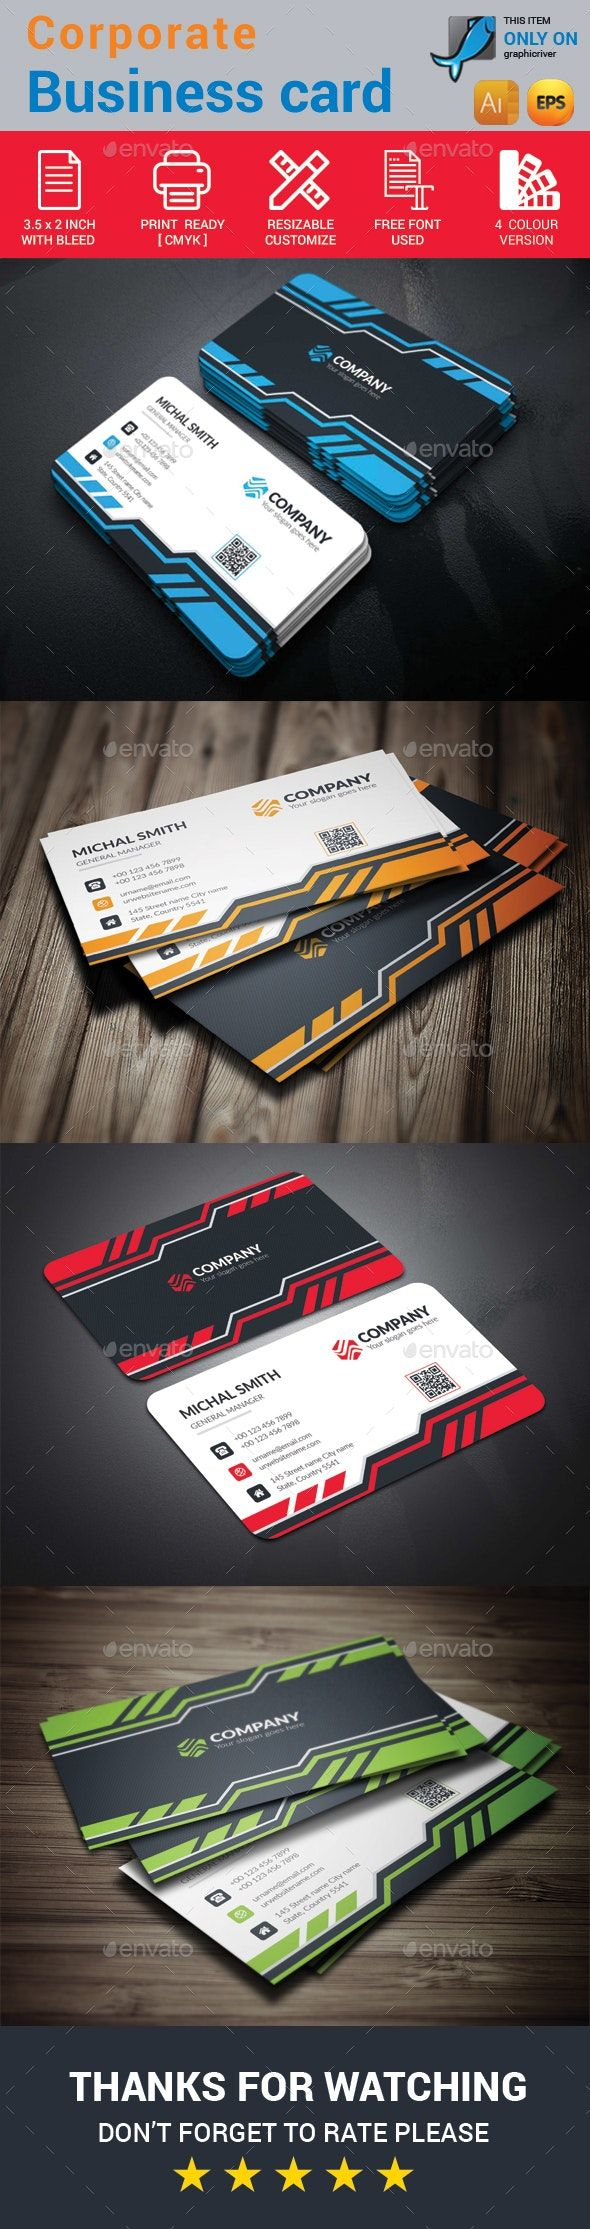 Business Card In 2020 Cool Business Cards Business Cards Buy Business Cards